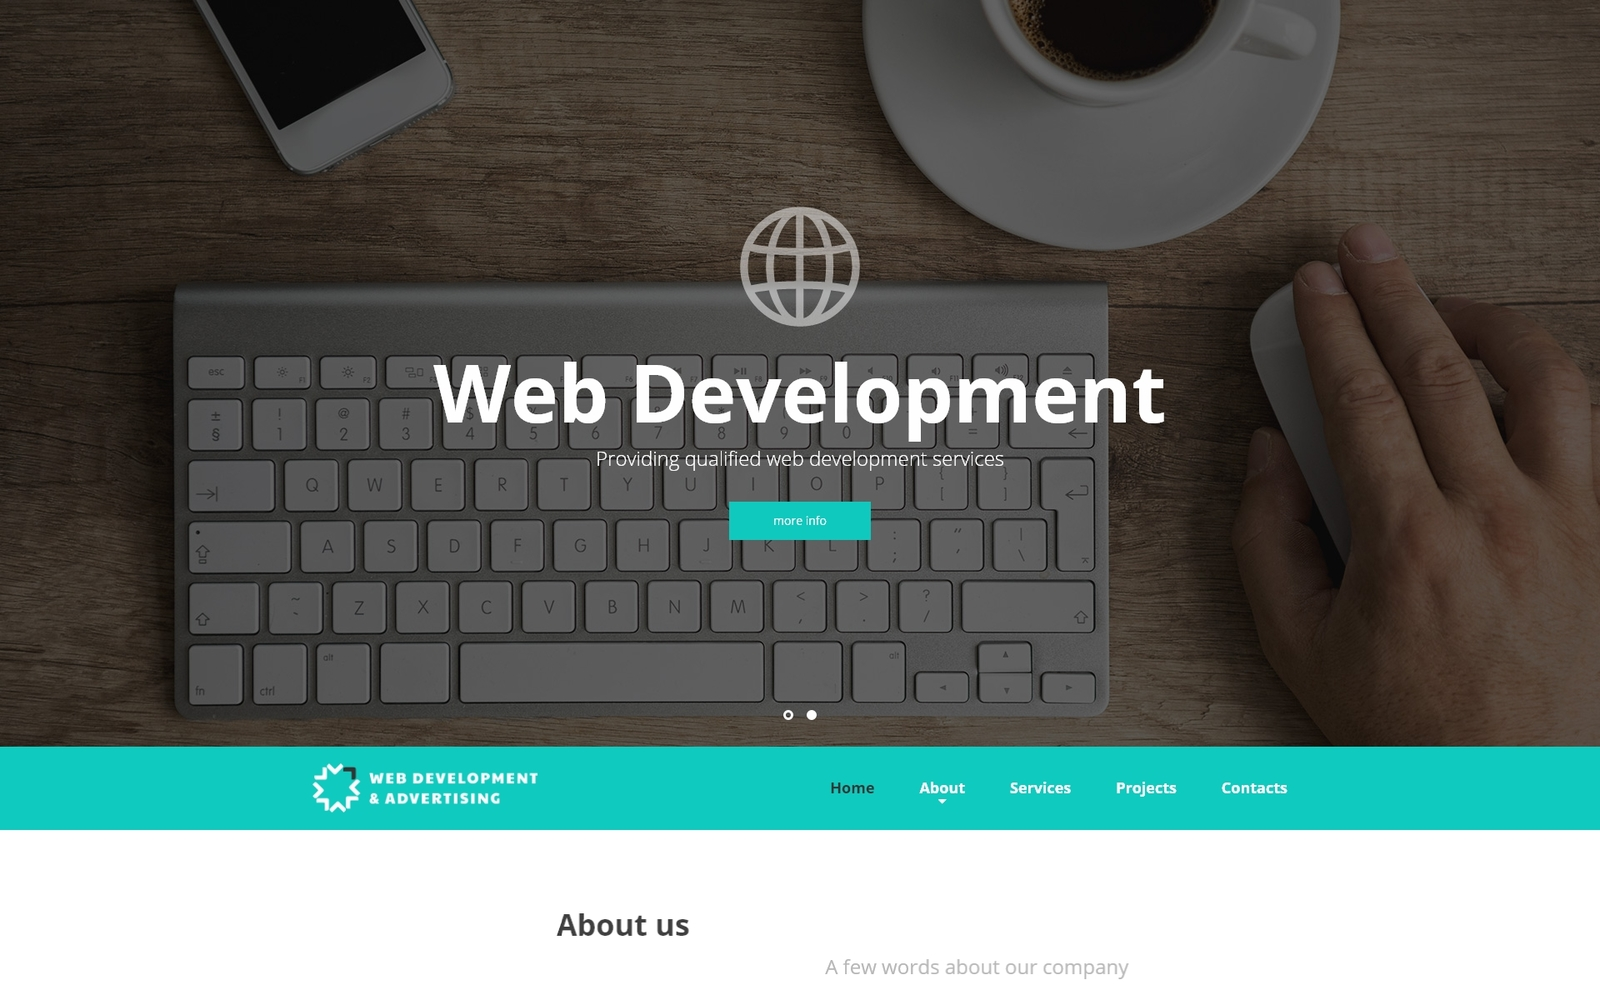 Responsivt Web Development & Advertising - Web Development Responsive Hemsidemall #52537